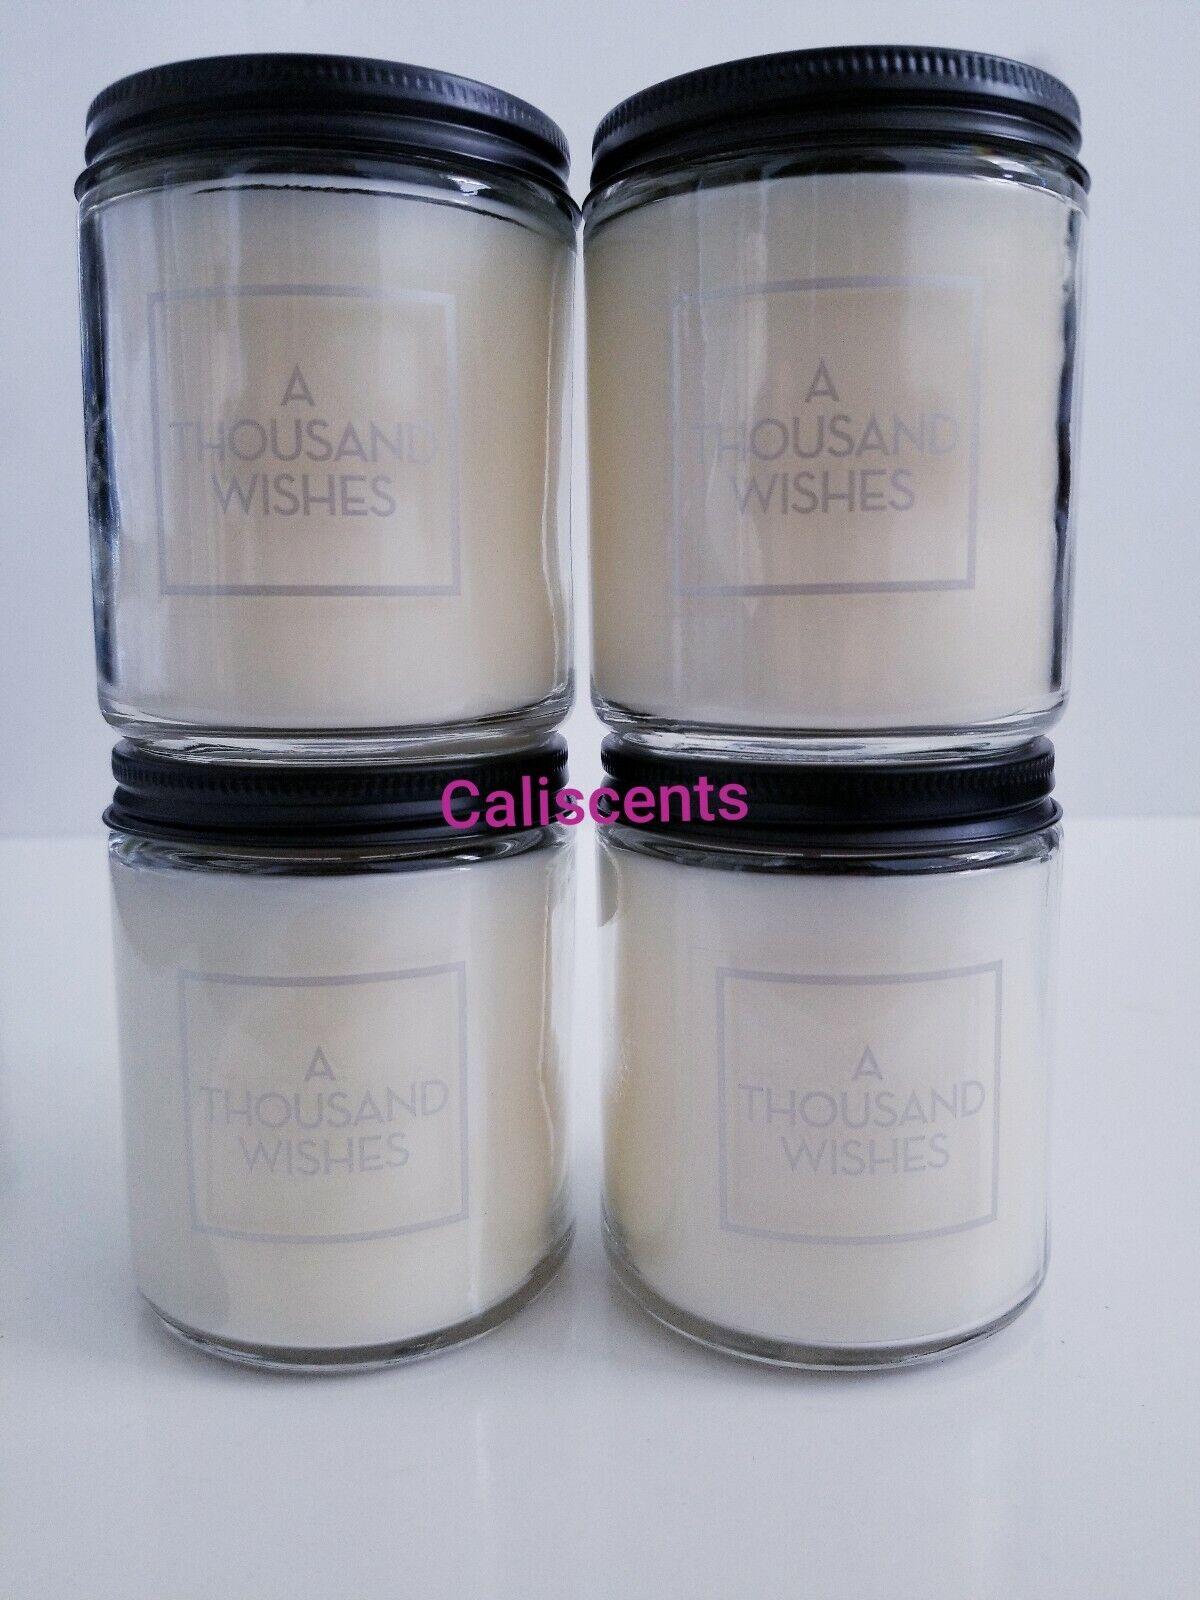 Bath & Body Works A THOUSAND  WISHES 7 oz Candles  Burns 20-30 Hrs X4  Ltd Etd